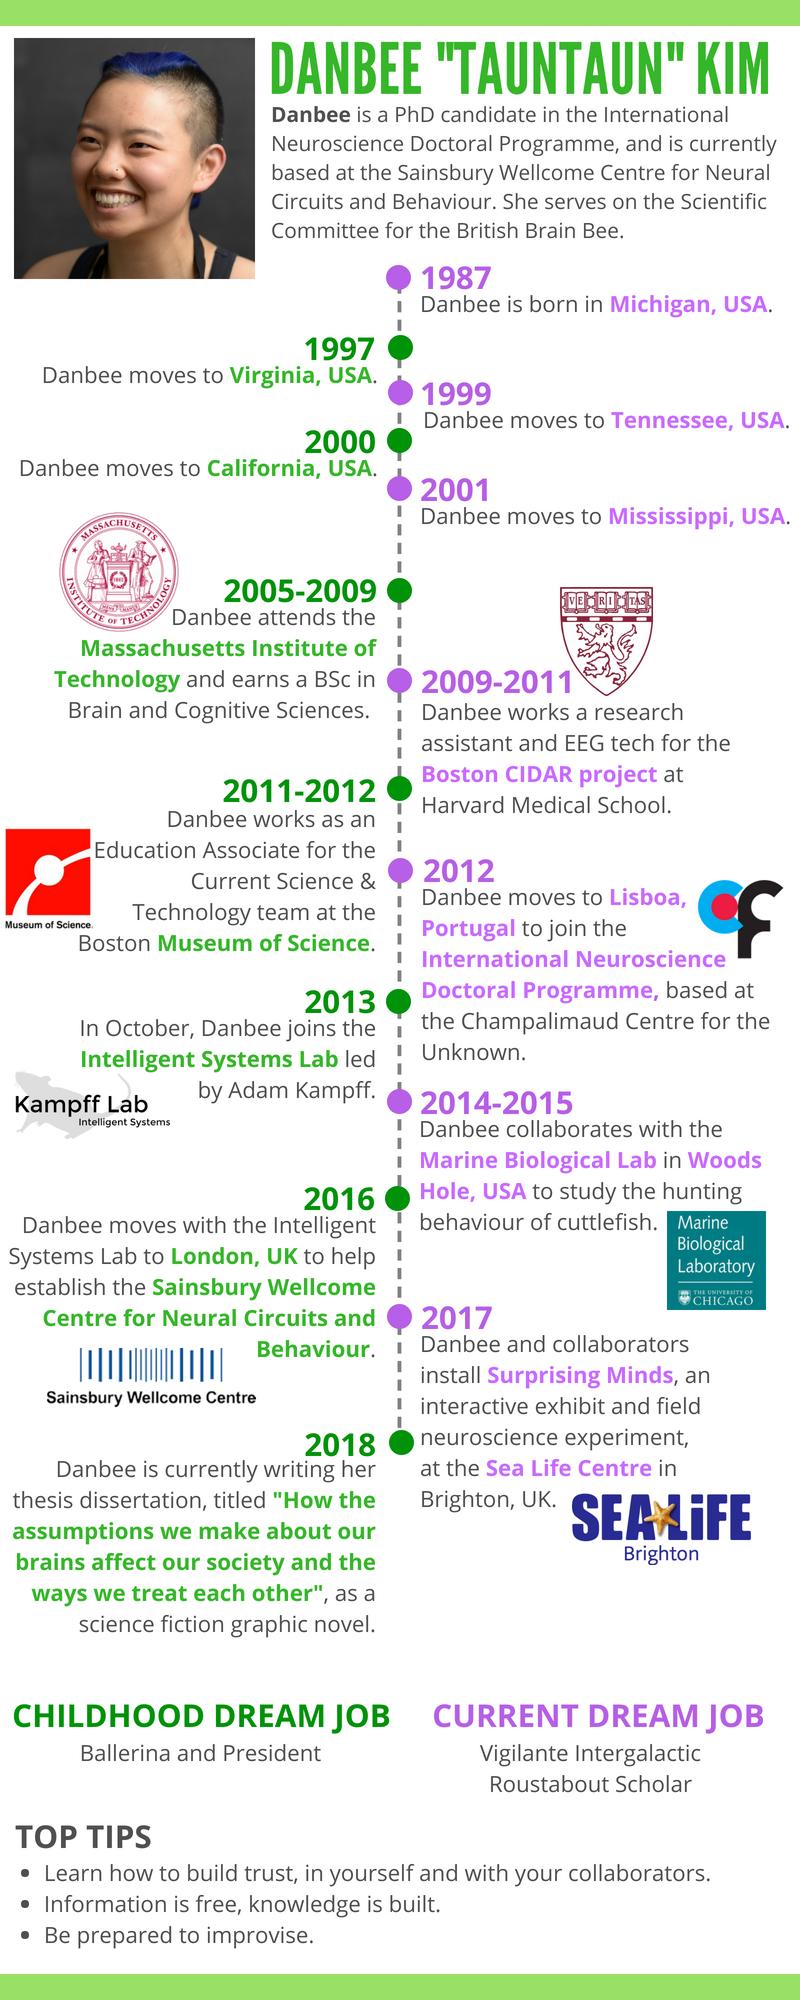 Danbee Kim's brief personal timeline